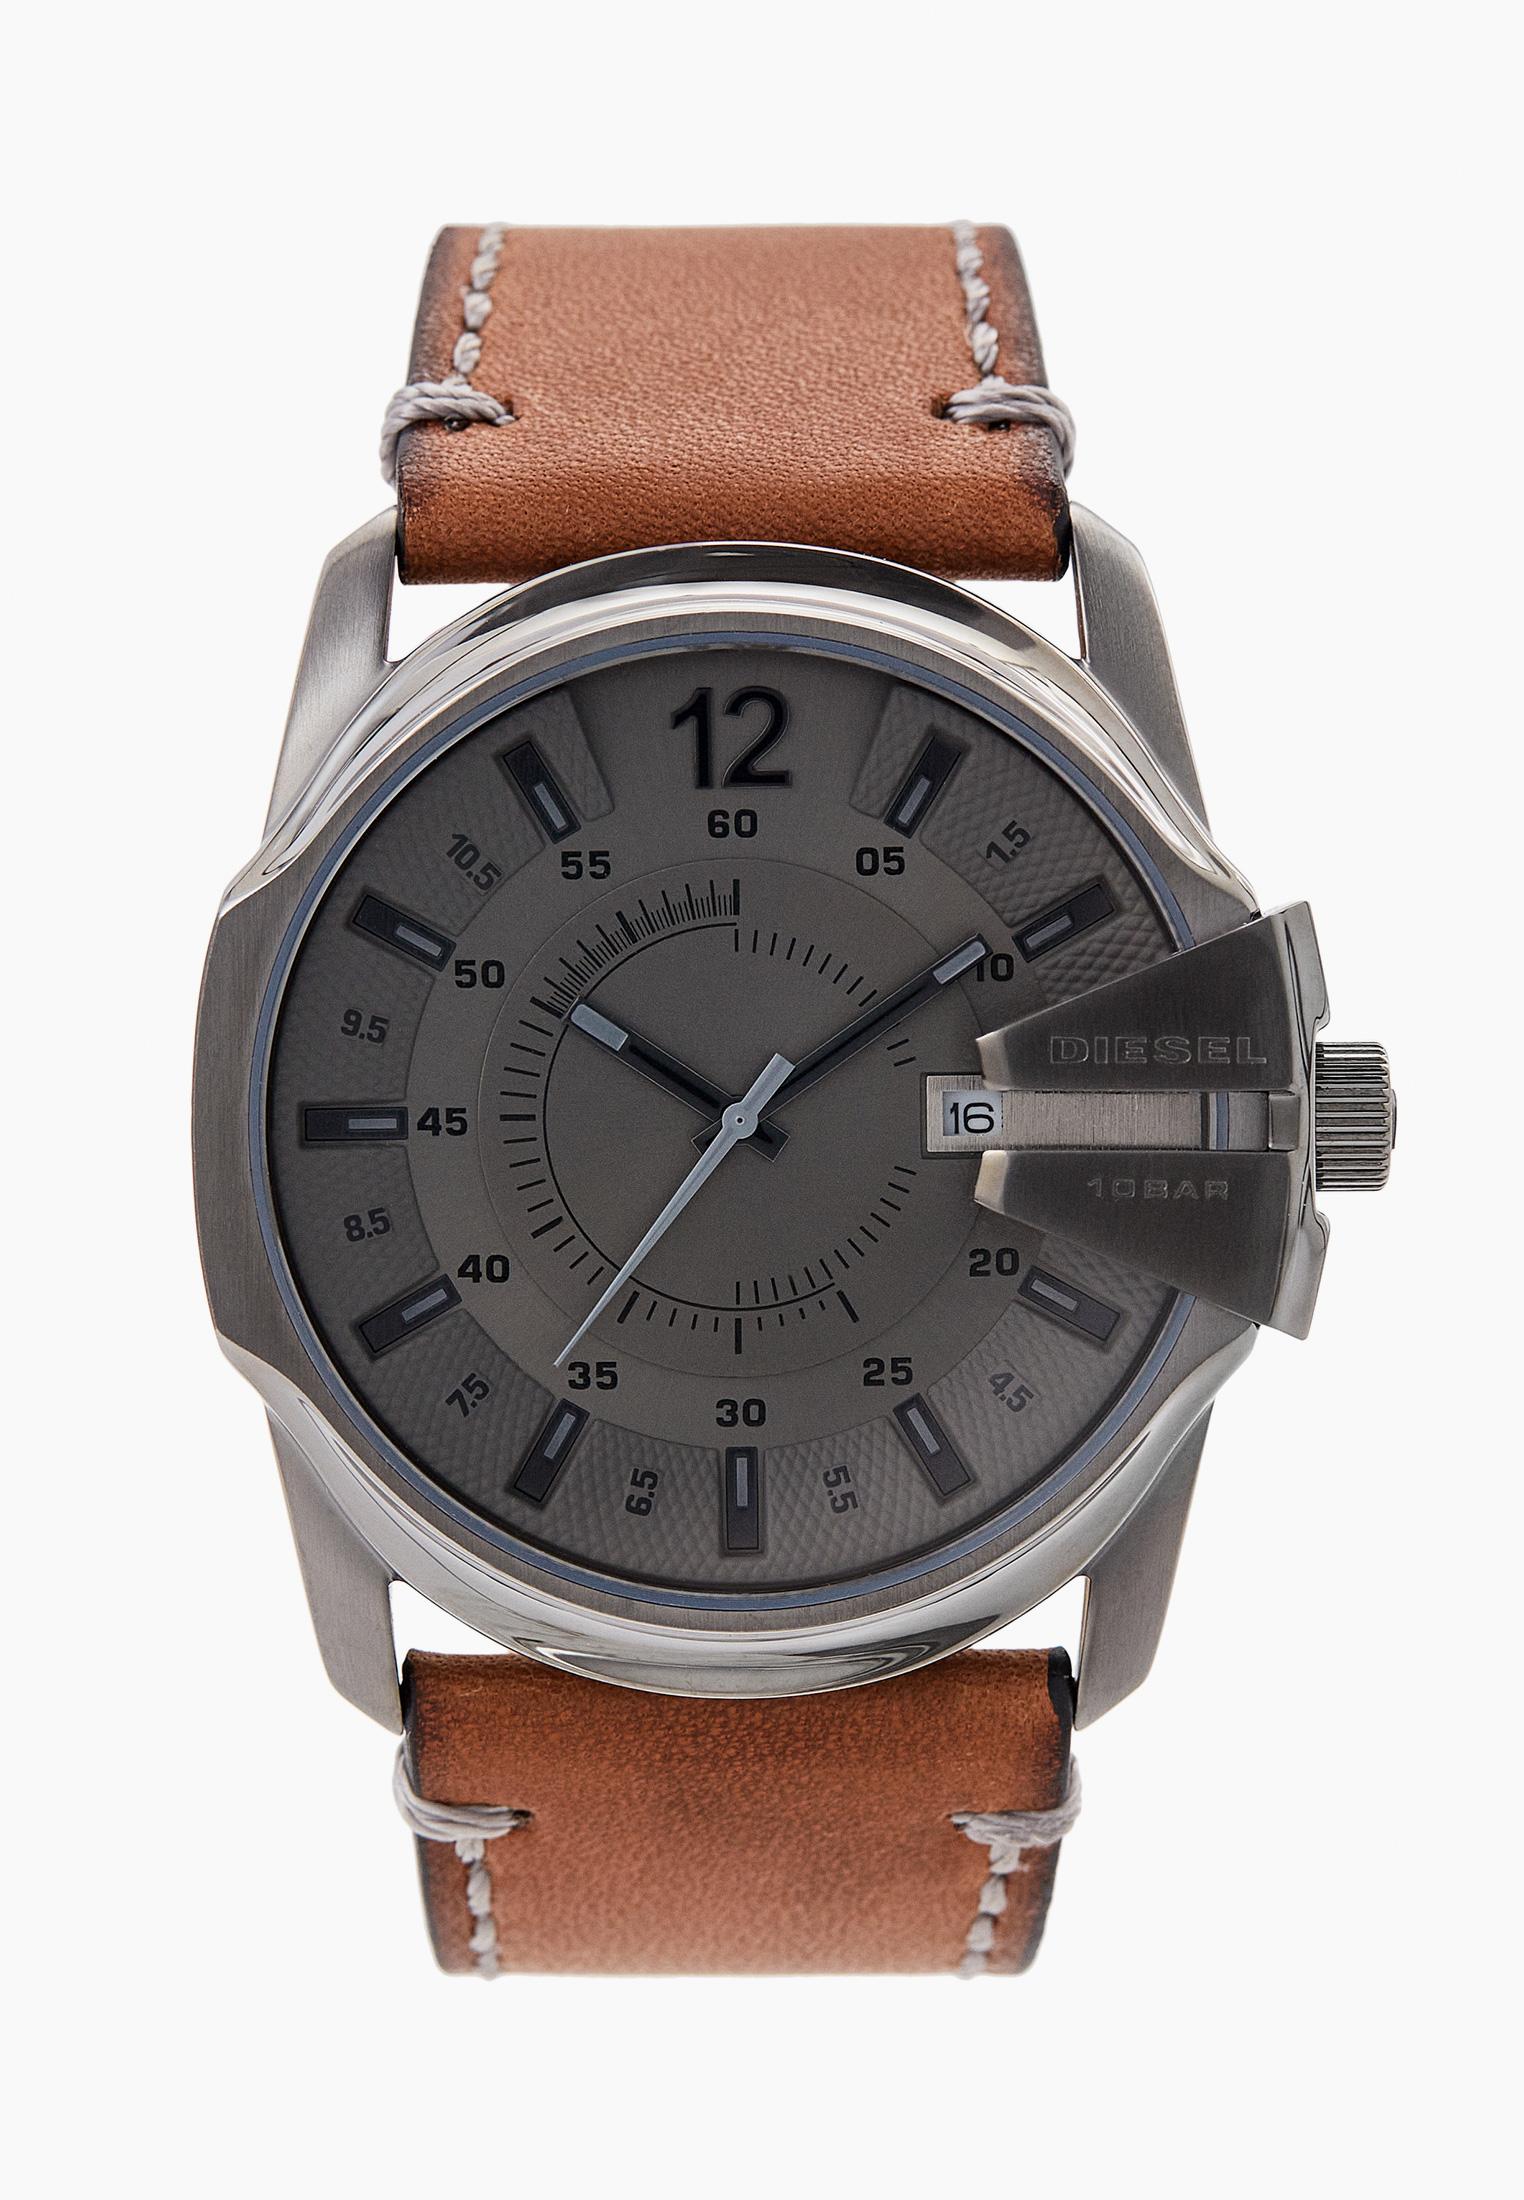 Мужские часы Diesel (Дизель) DZ1964